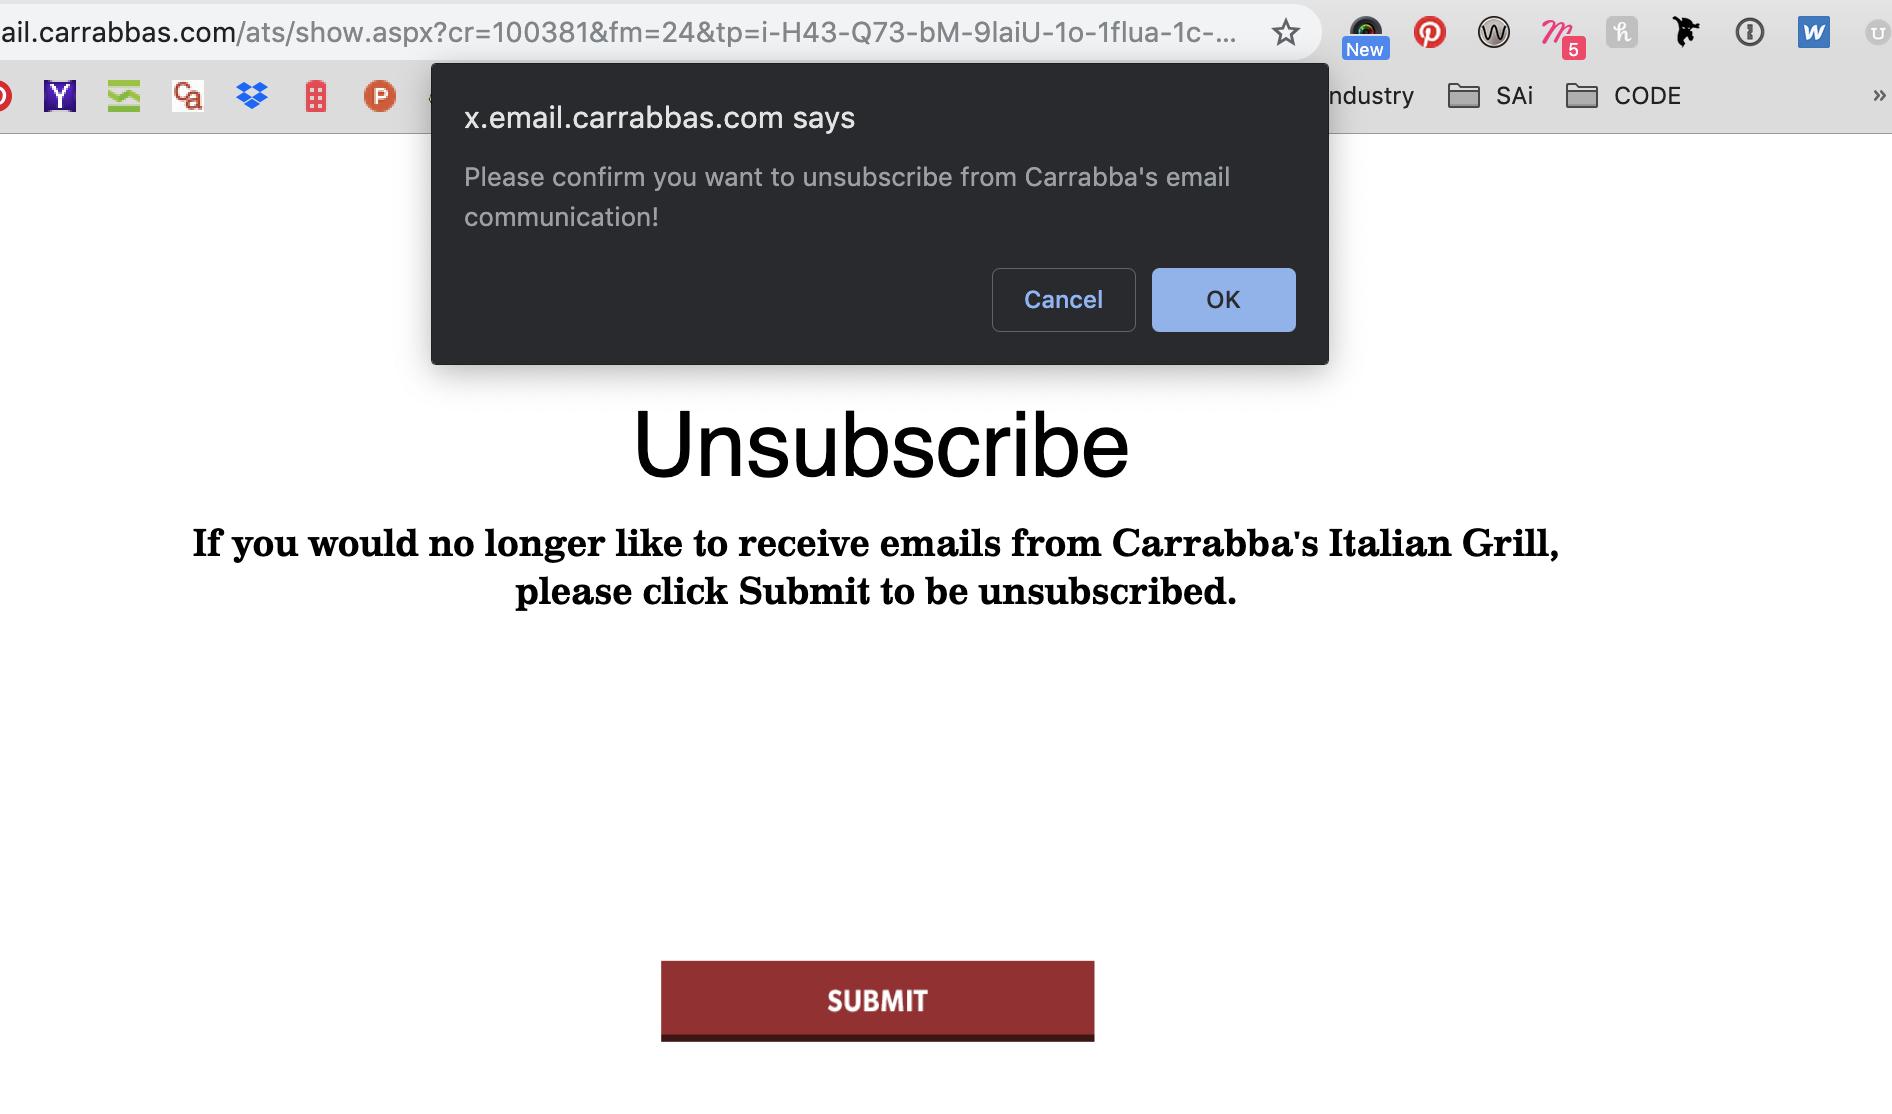 Carrabba's Unsubscribe Popup